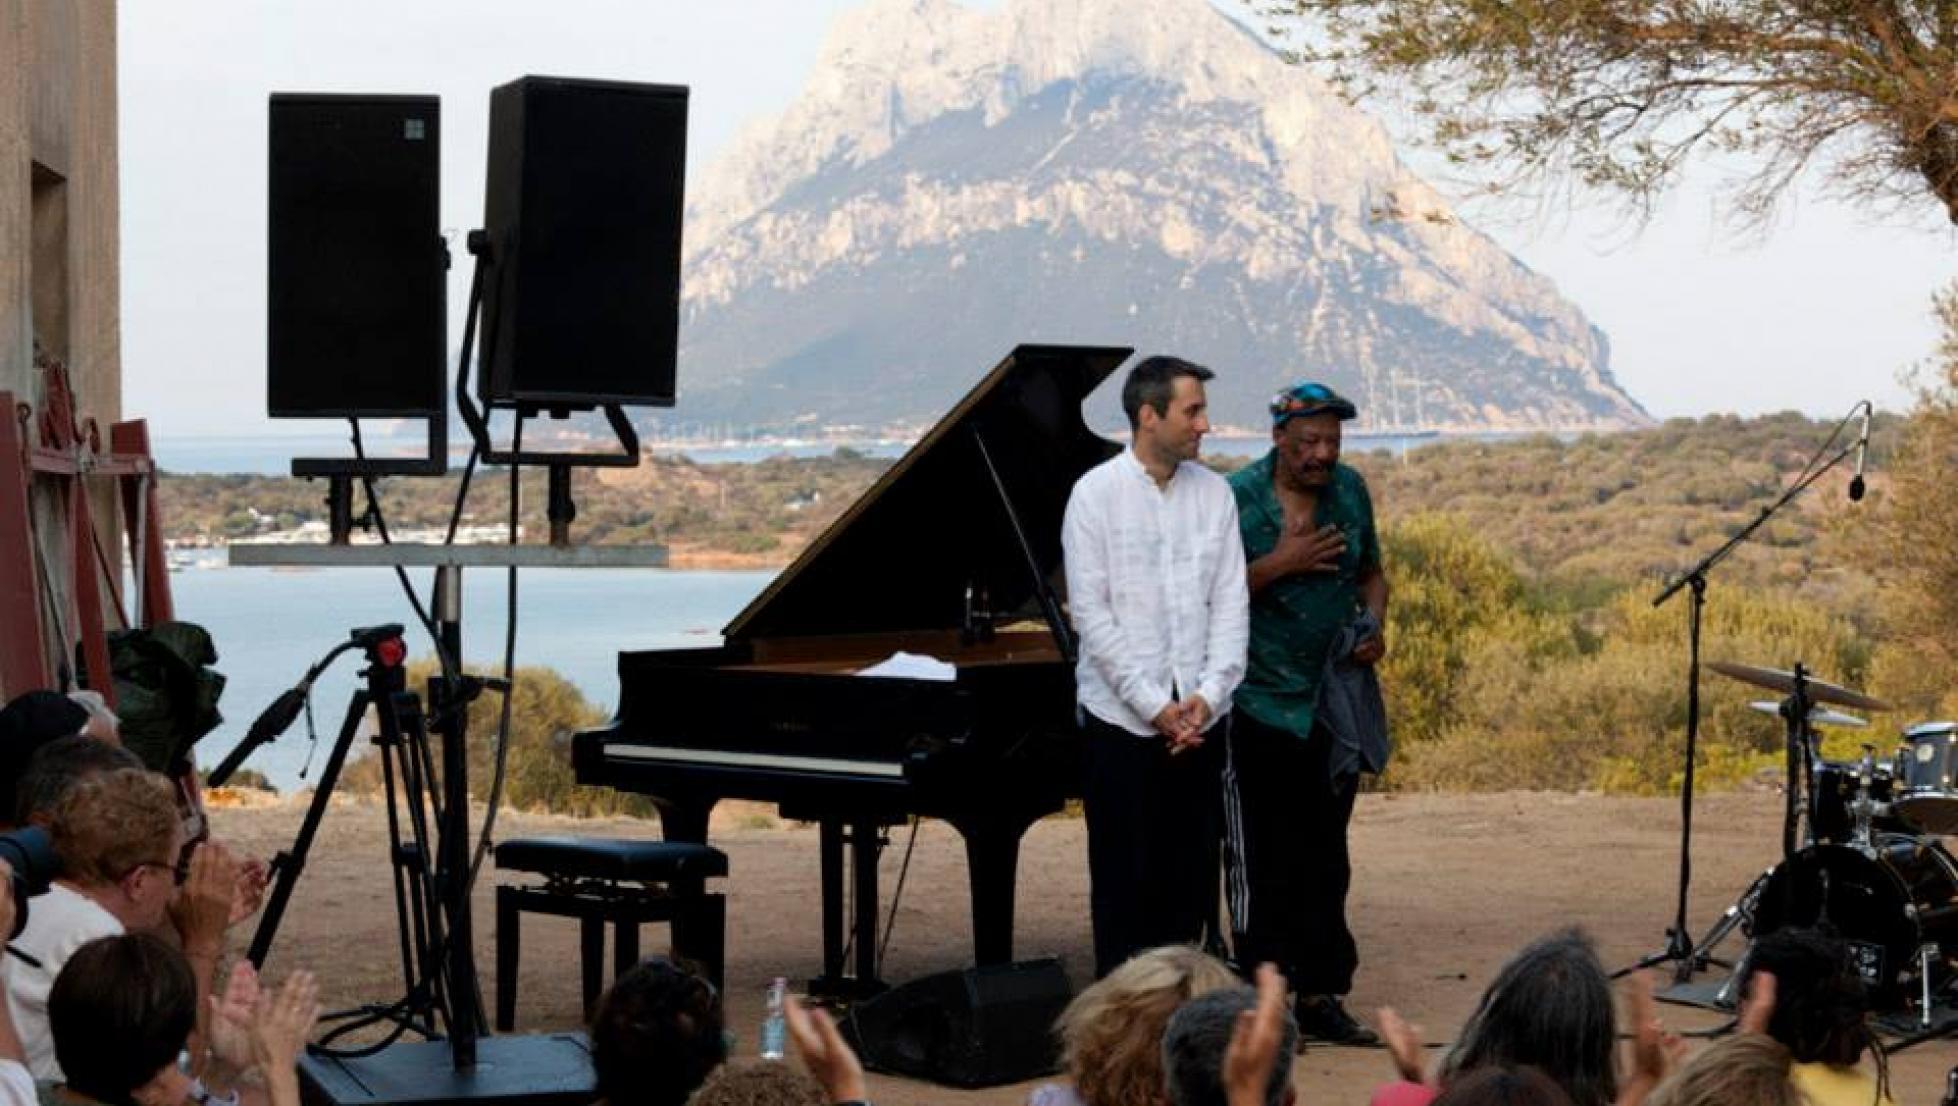 Time in jazz - Loiri Porto San Paolo